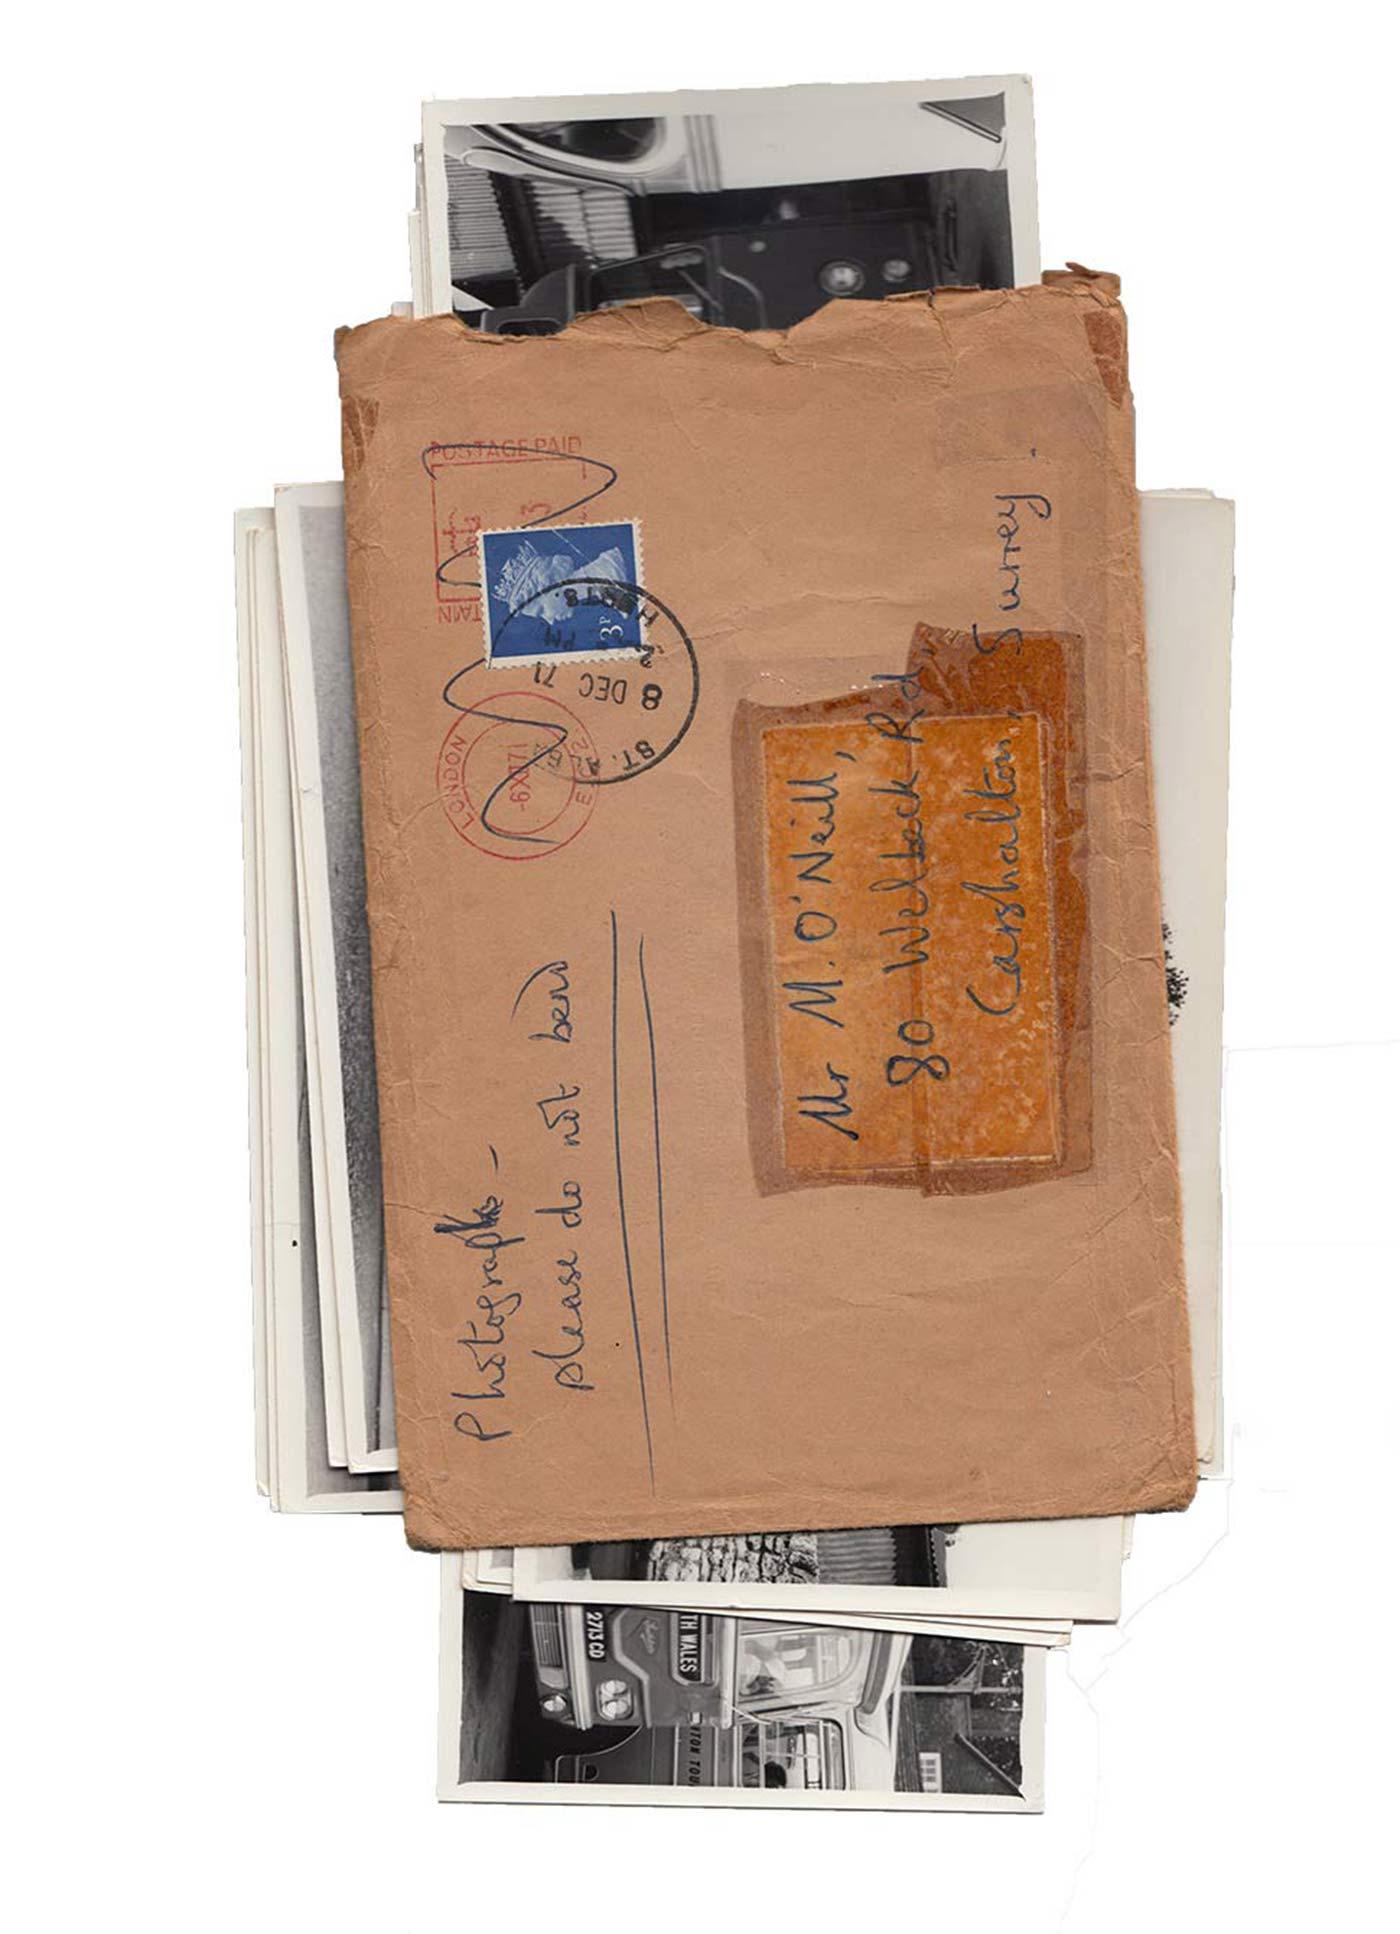 paula-roush-bus-spotting-photobook-msdm-publications-orphan1-54